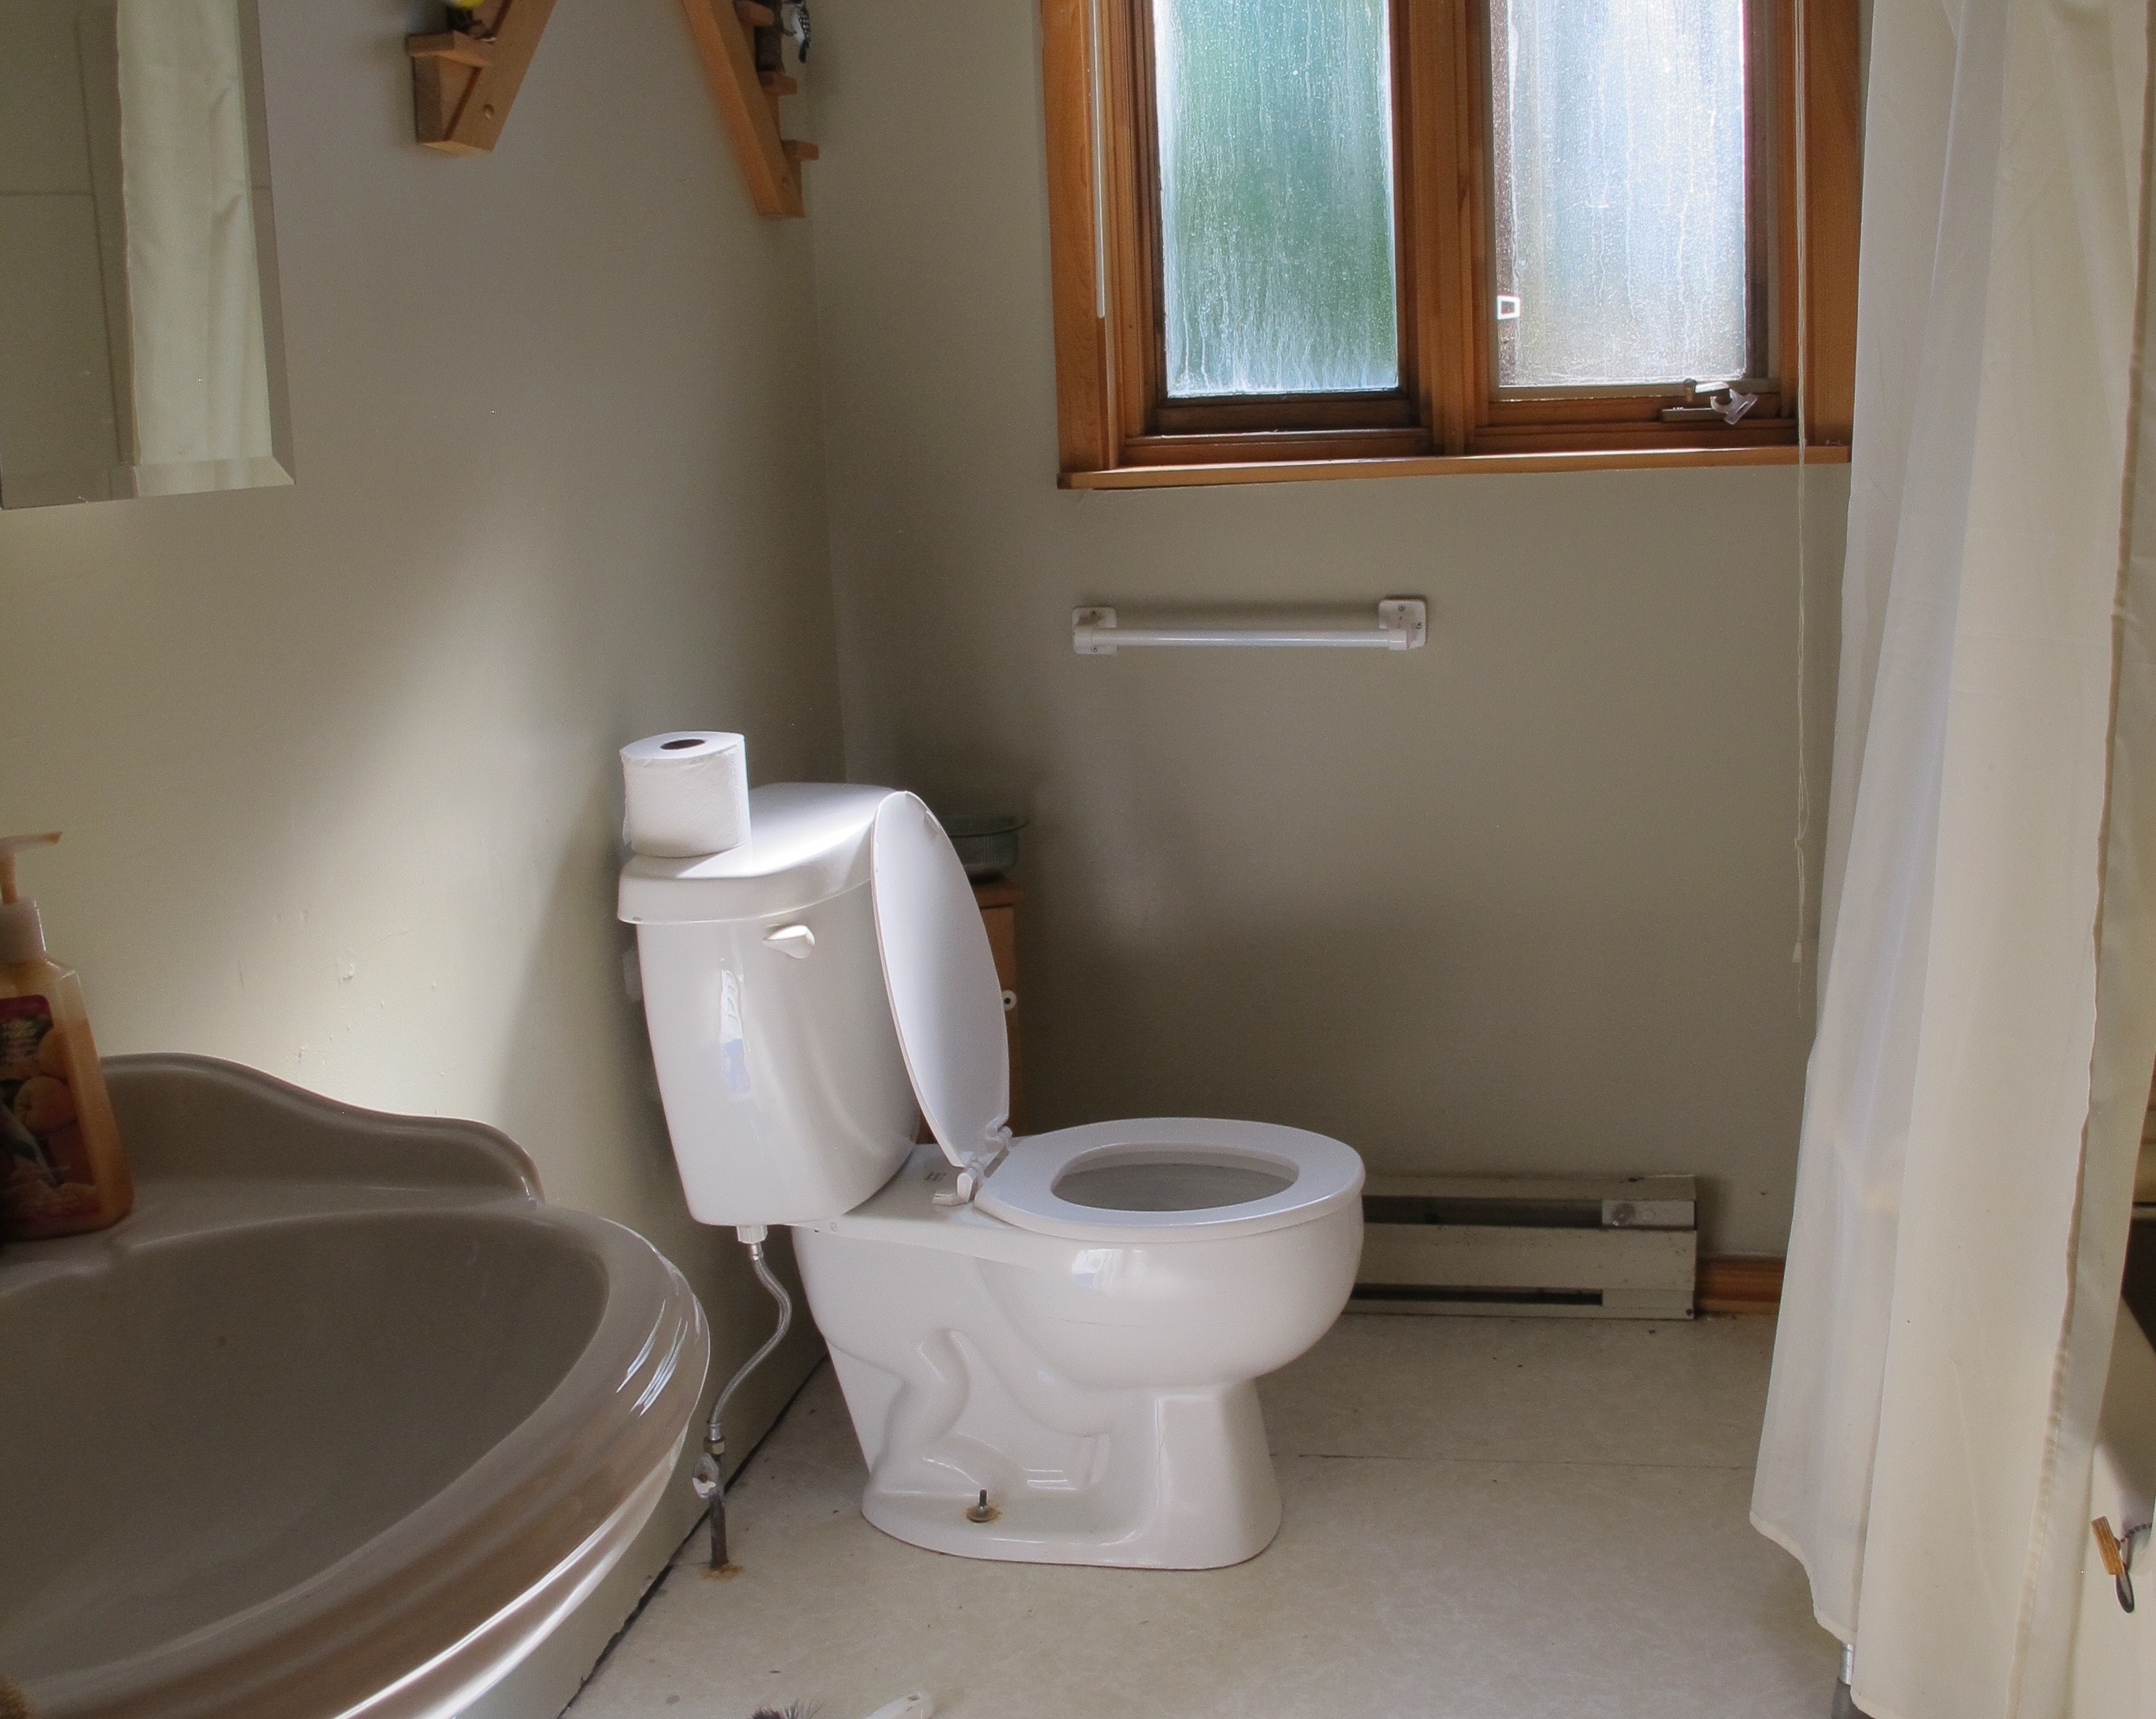 Modern cottage bathroom - 2016 04 28 1461851264 4897363 Img_4550 Jpg